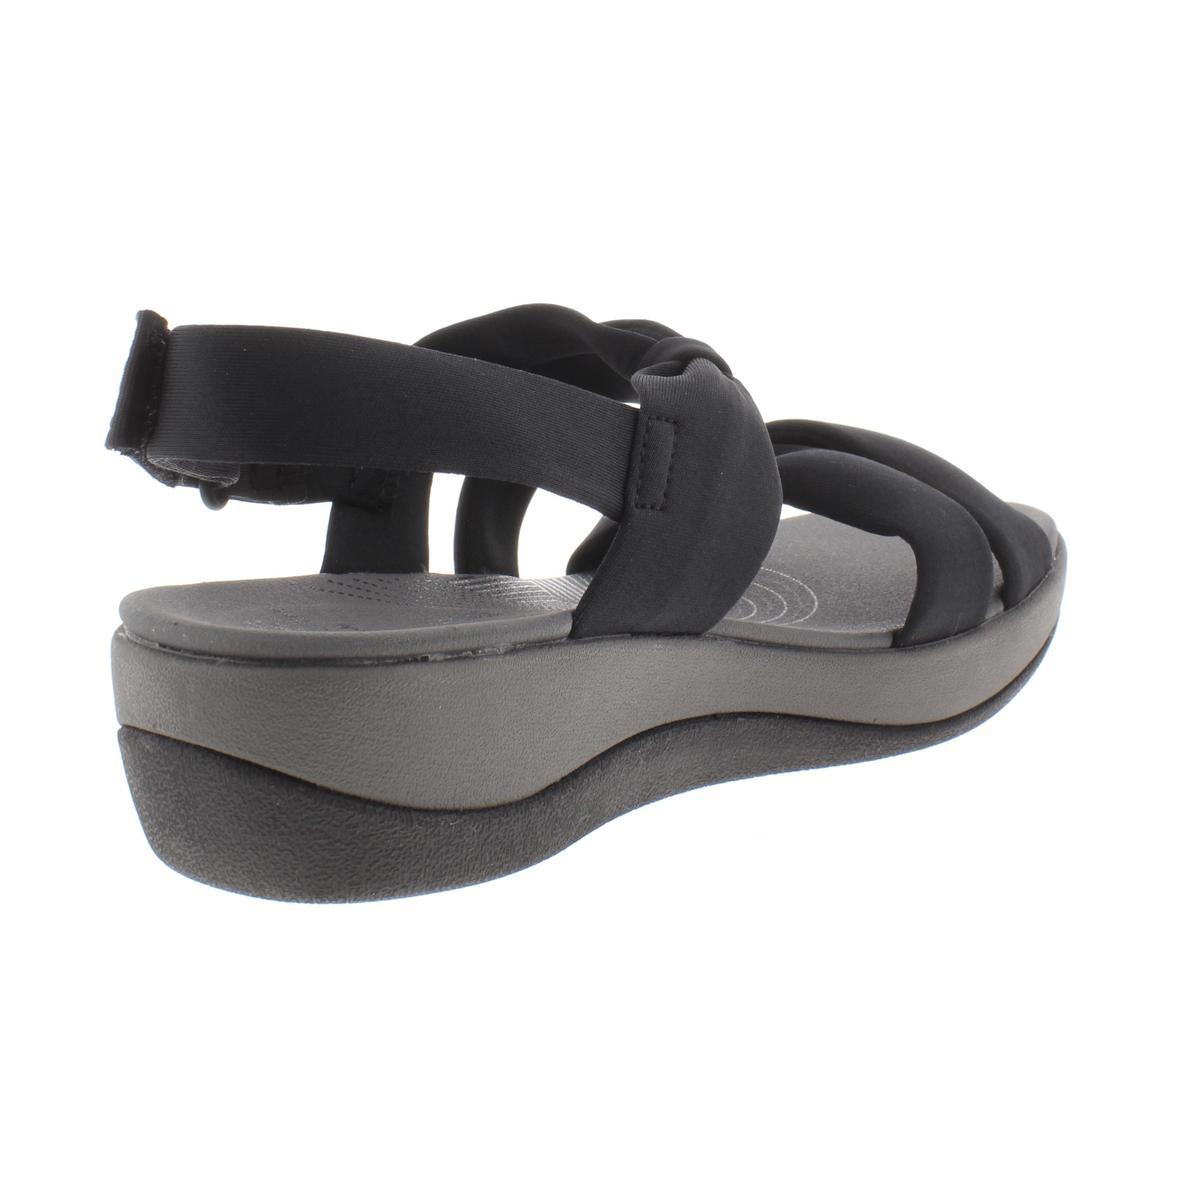 Clarks-Womens-Arla-Mae-Bow-Wedge-Open-Toe-Slingback-Sandals-Shoes-BHFO-7545 thumbnail 4